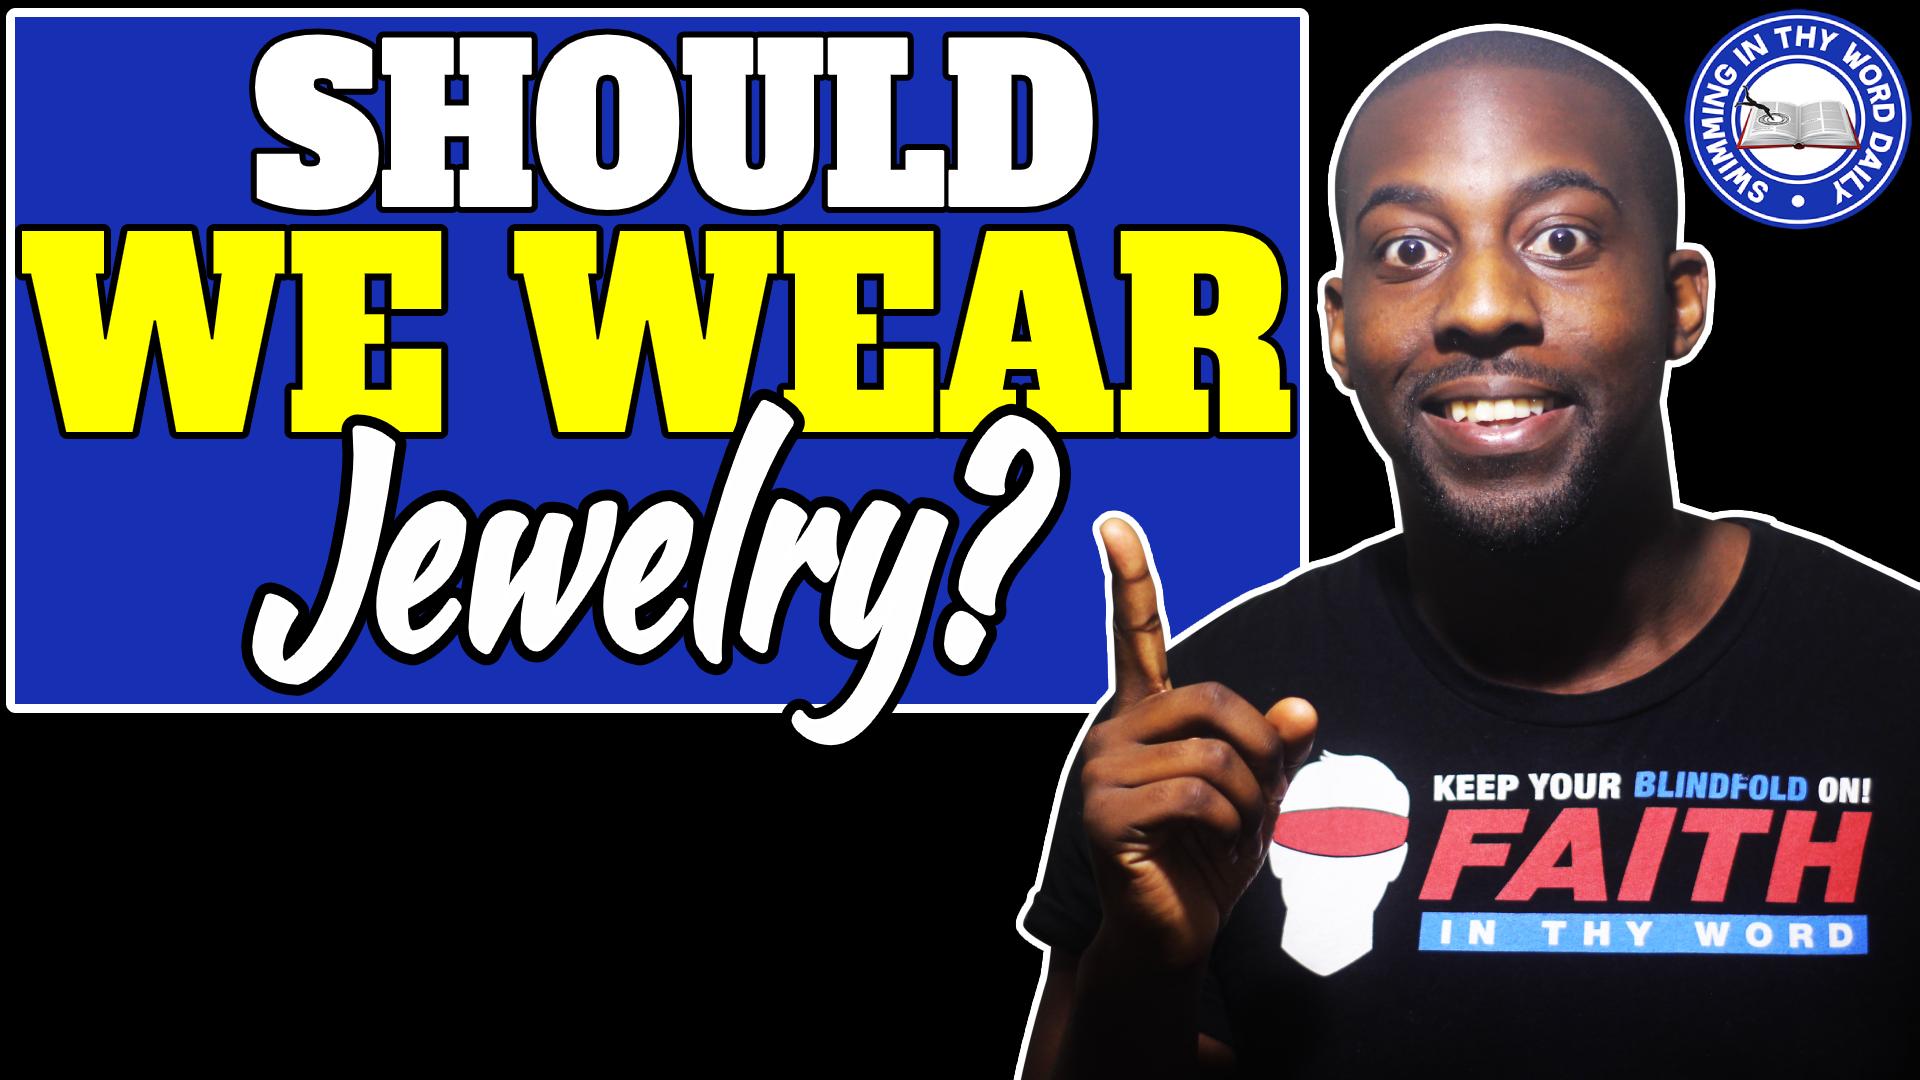 Should a Christian Wear Jewelry